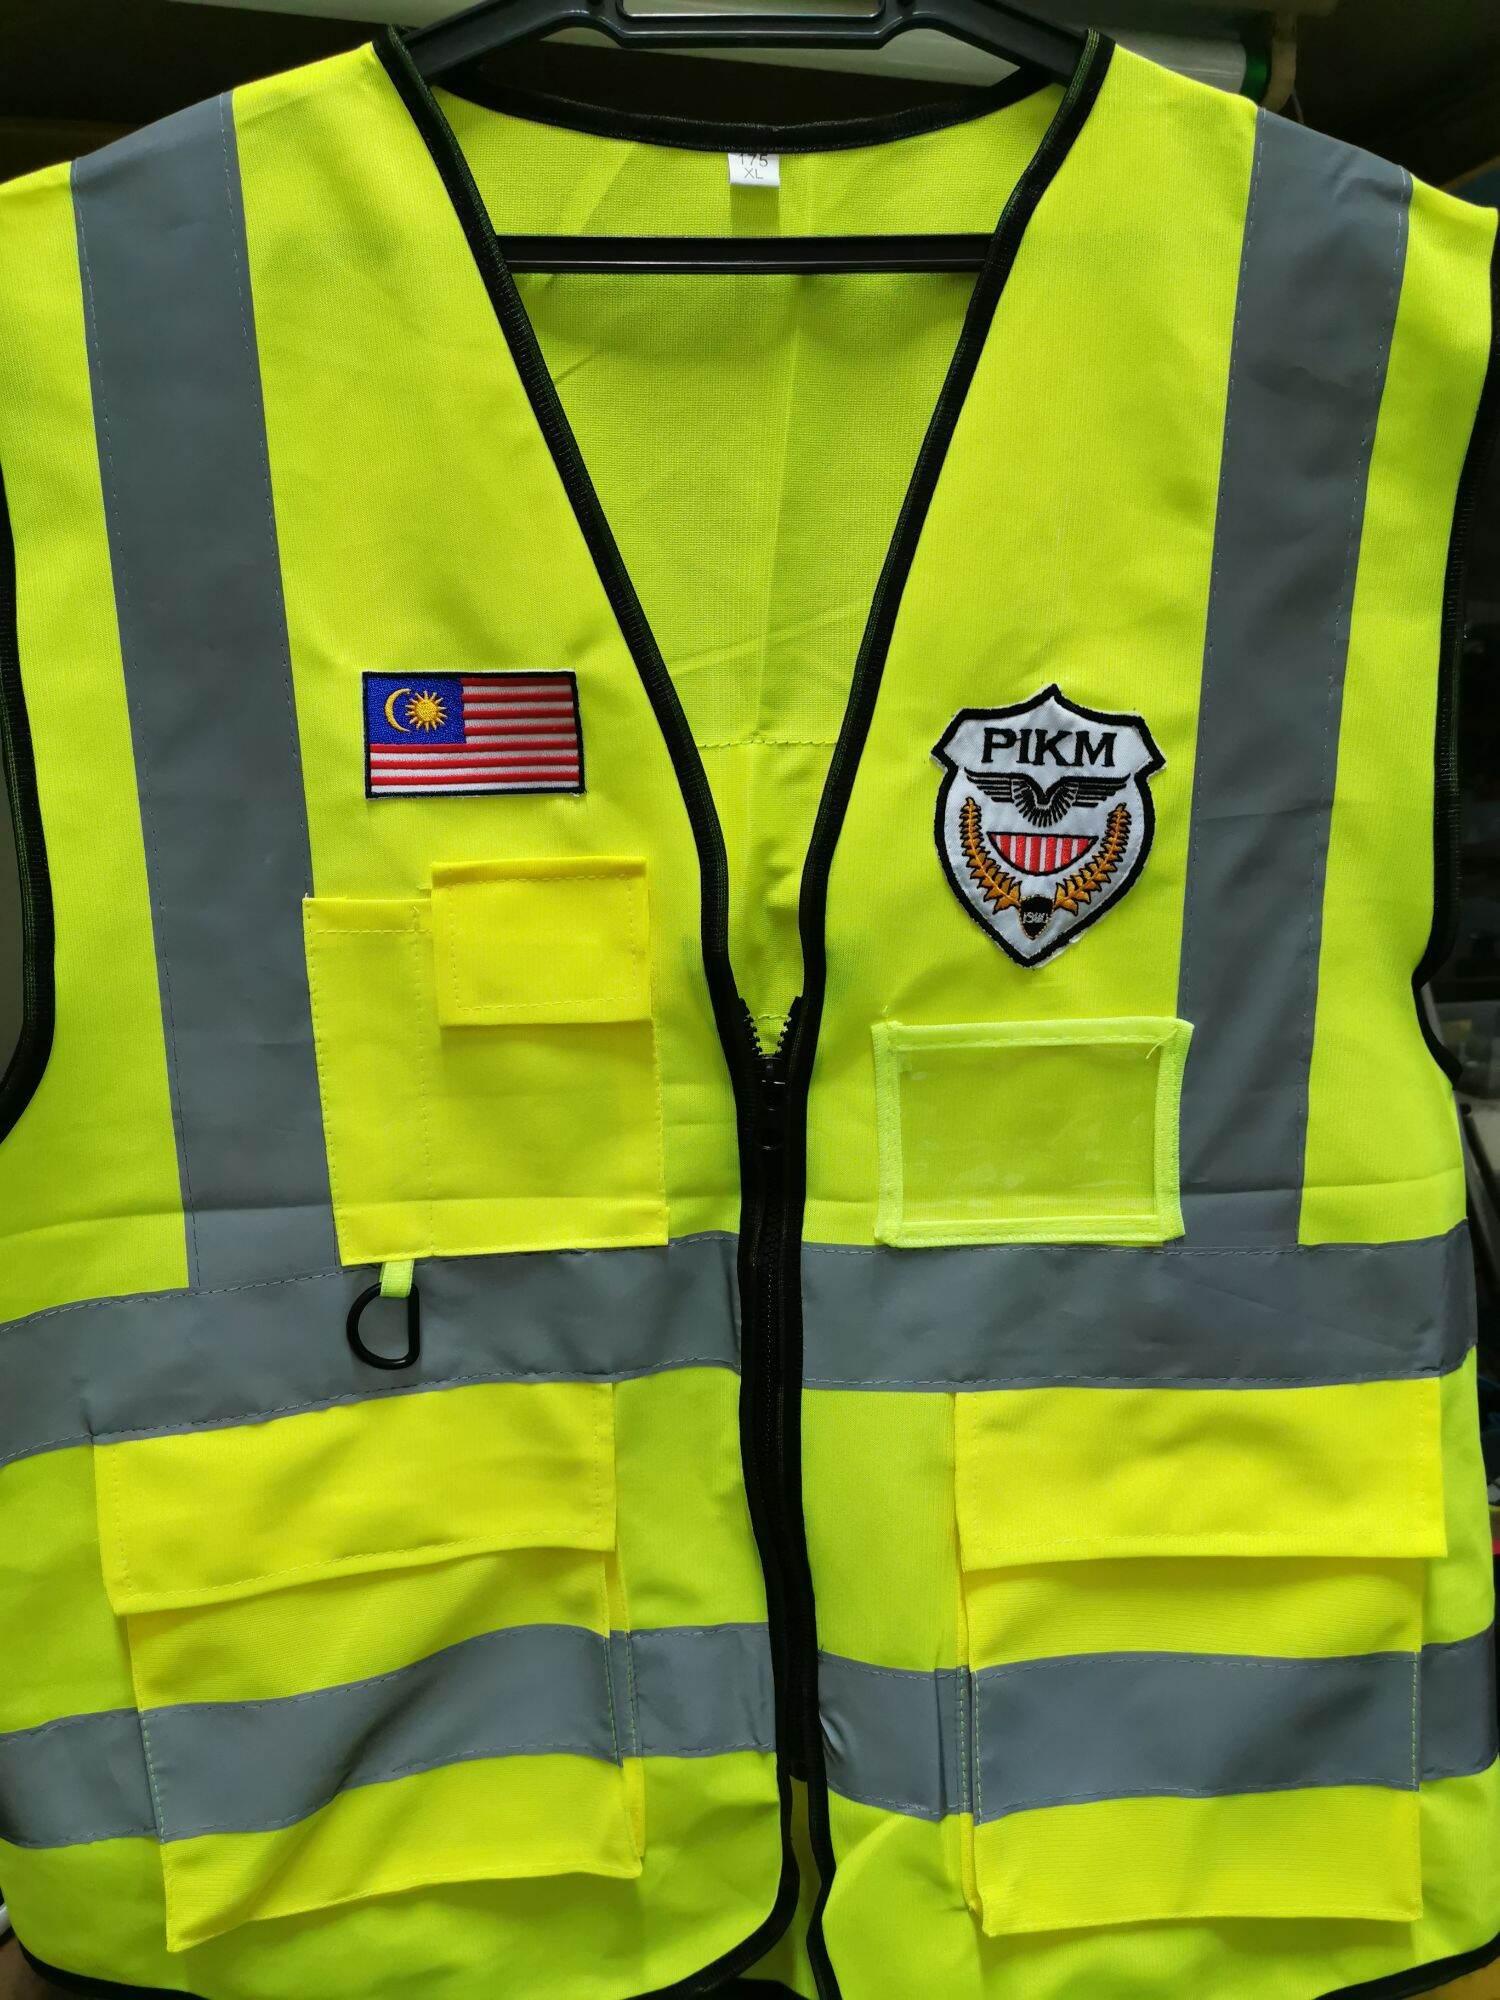 Vest Reflective Security 4 Pocket Vest Pantulan Cahaya Logo Bendera PIKM Security